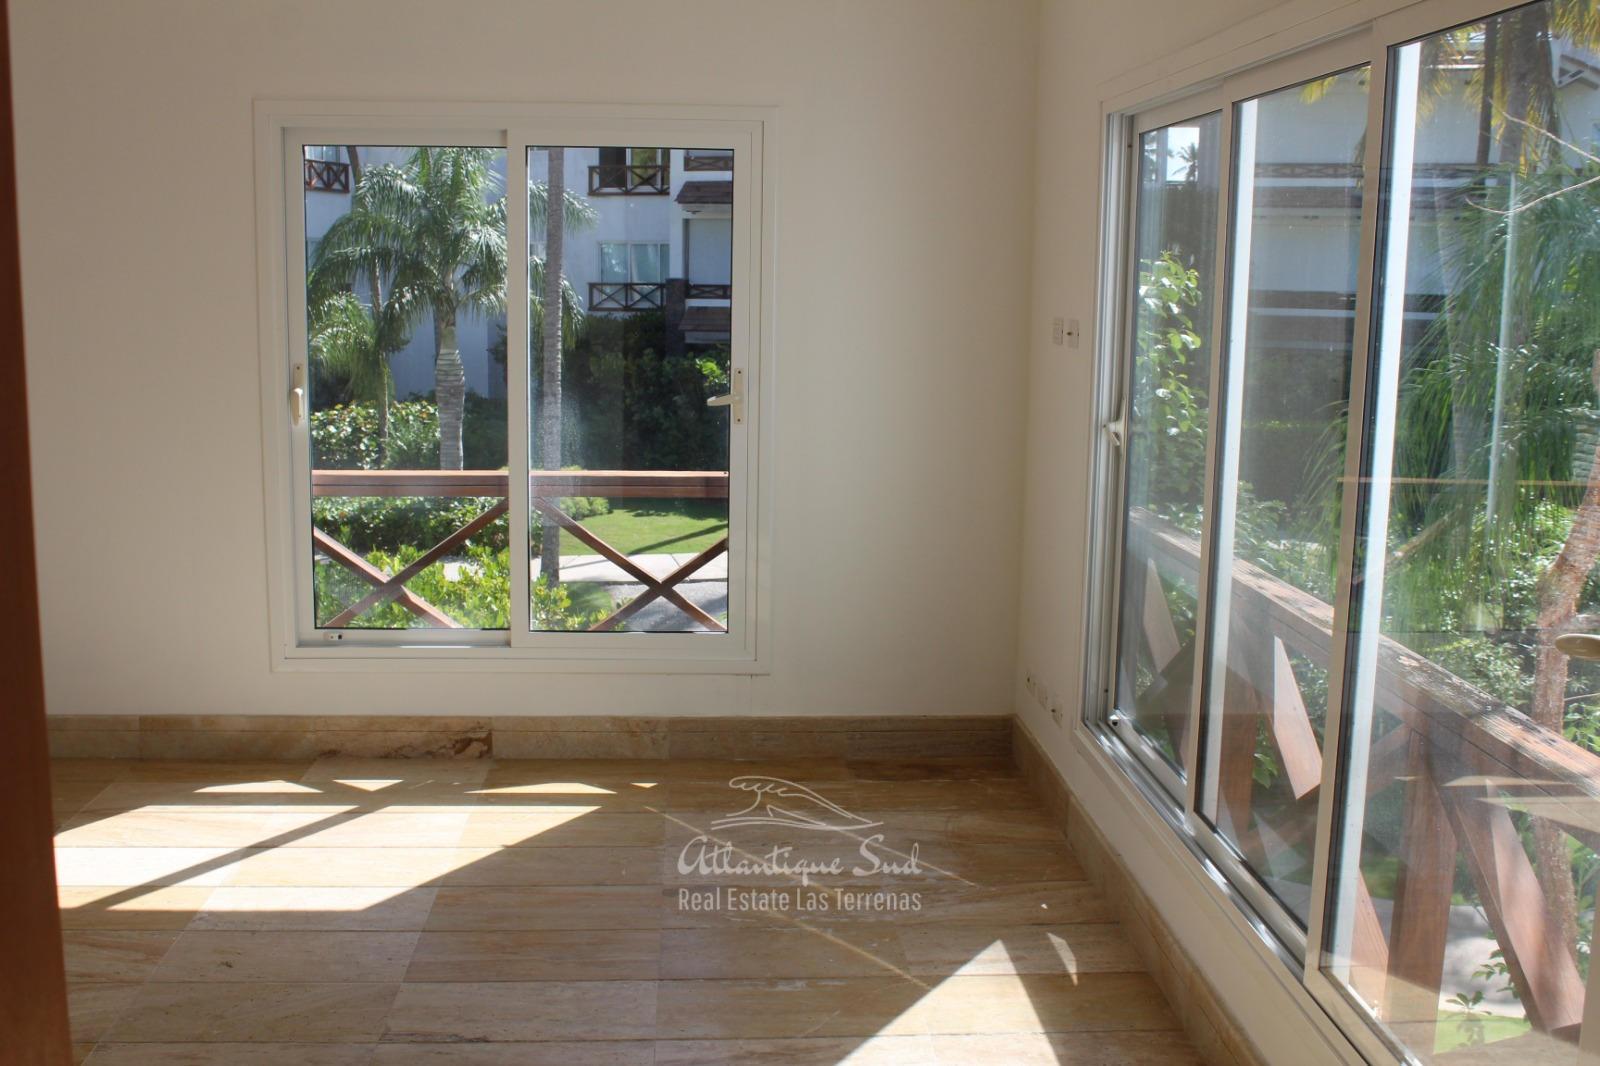 Apartments near the beach real estate las terrenas dominican republic 31 (22).jpg